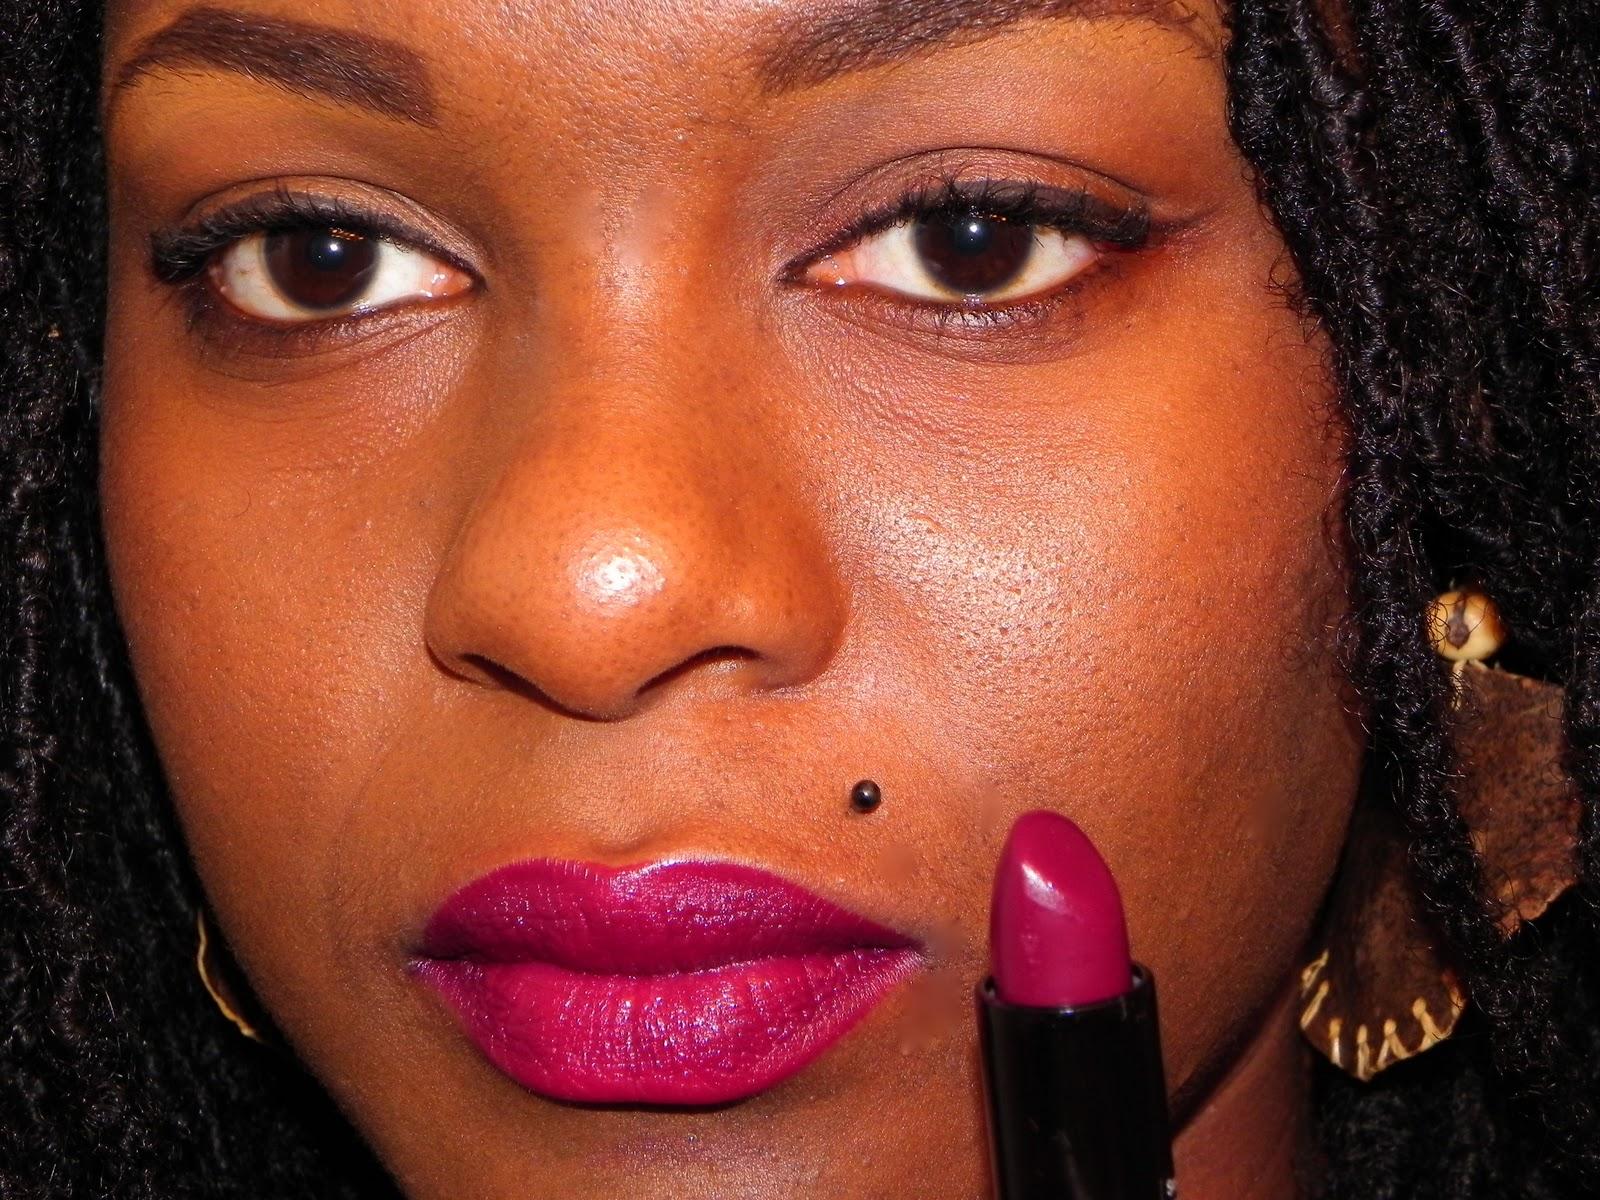 Mac Lipstick On Dark S...